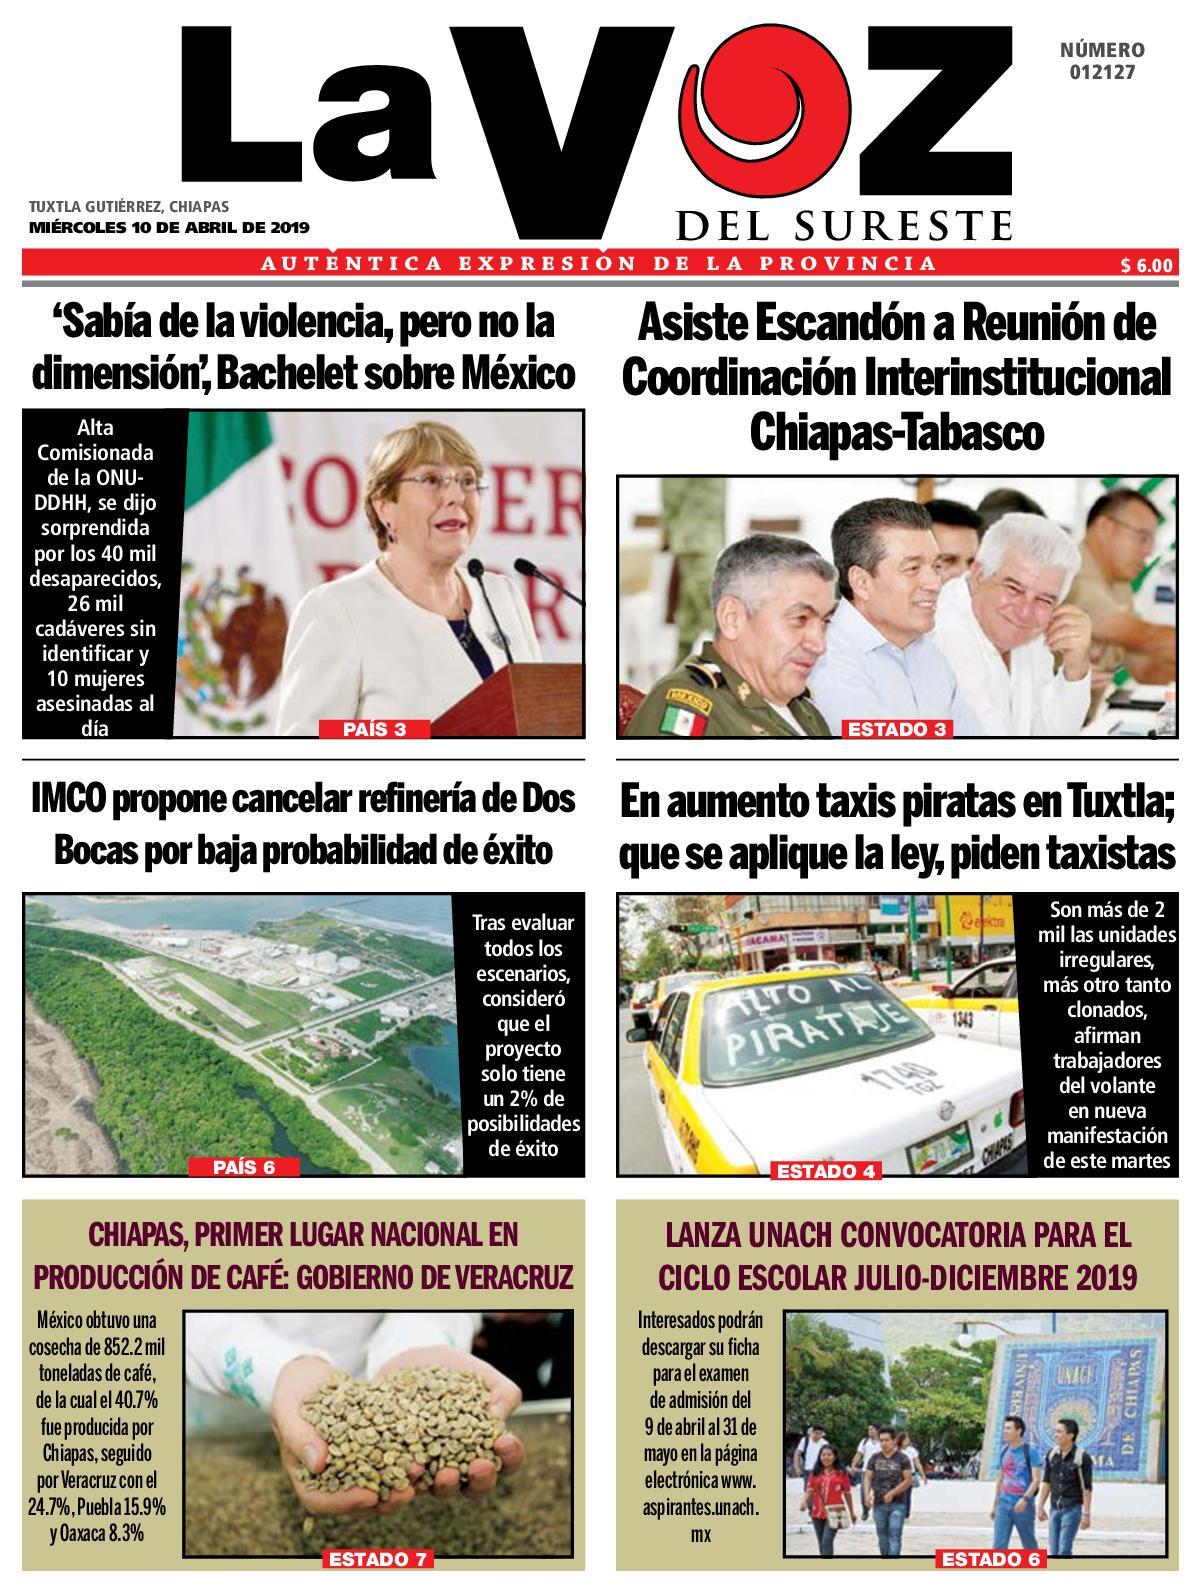 Diario Voz La 10 2019 Sureste Del 04 Calaméo CxQdshtr